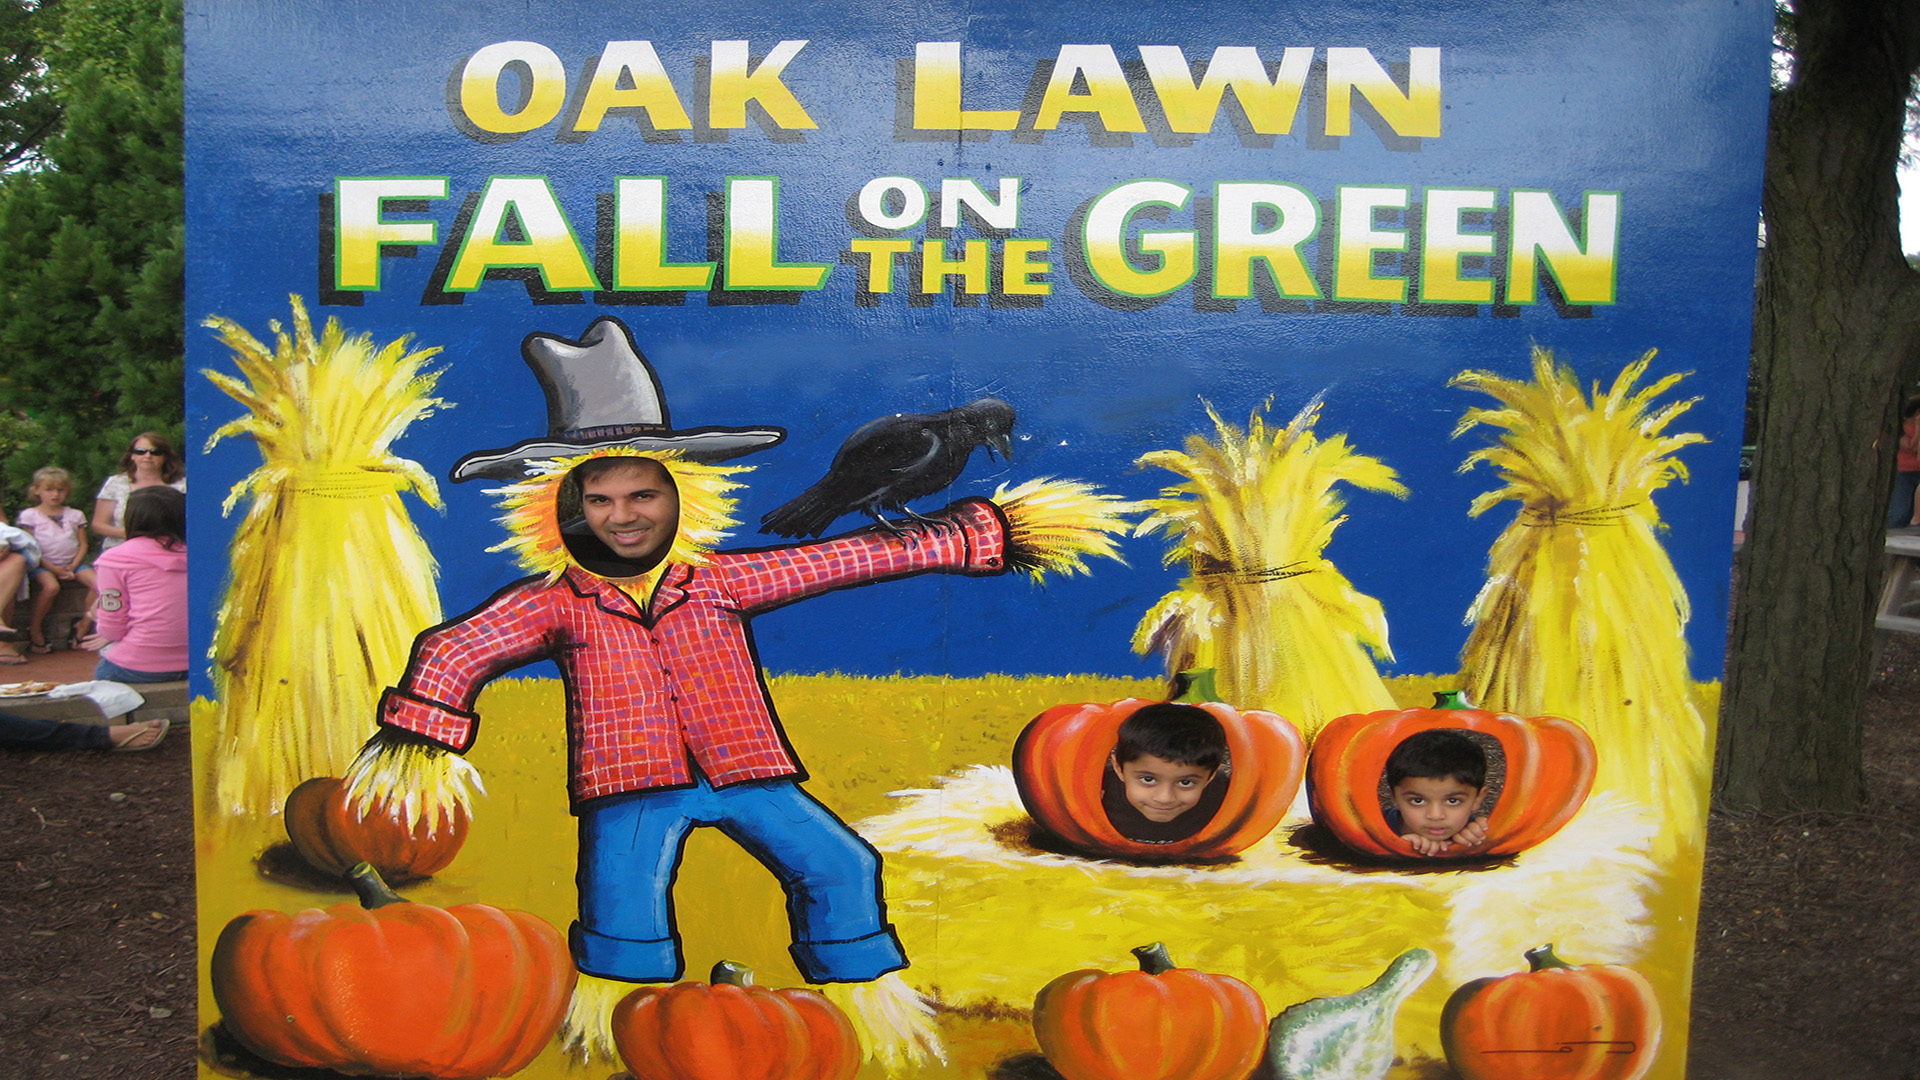 2009-Oak-Lawn-fall-on-the-greenIMG-5123